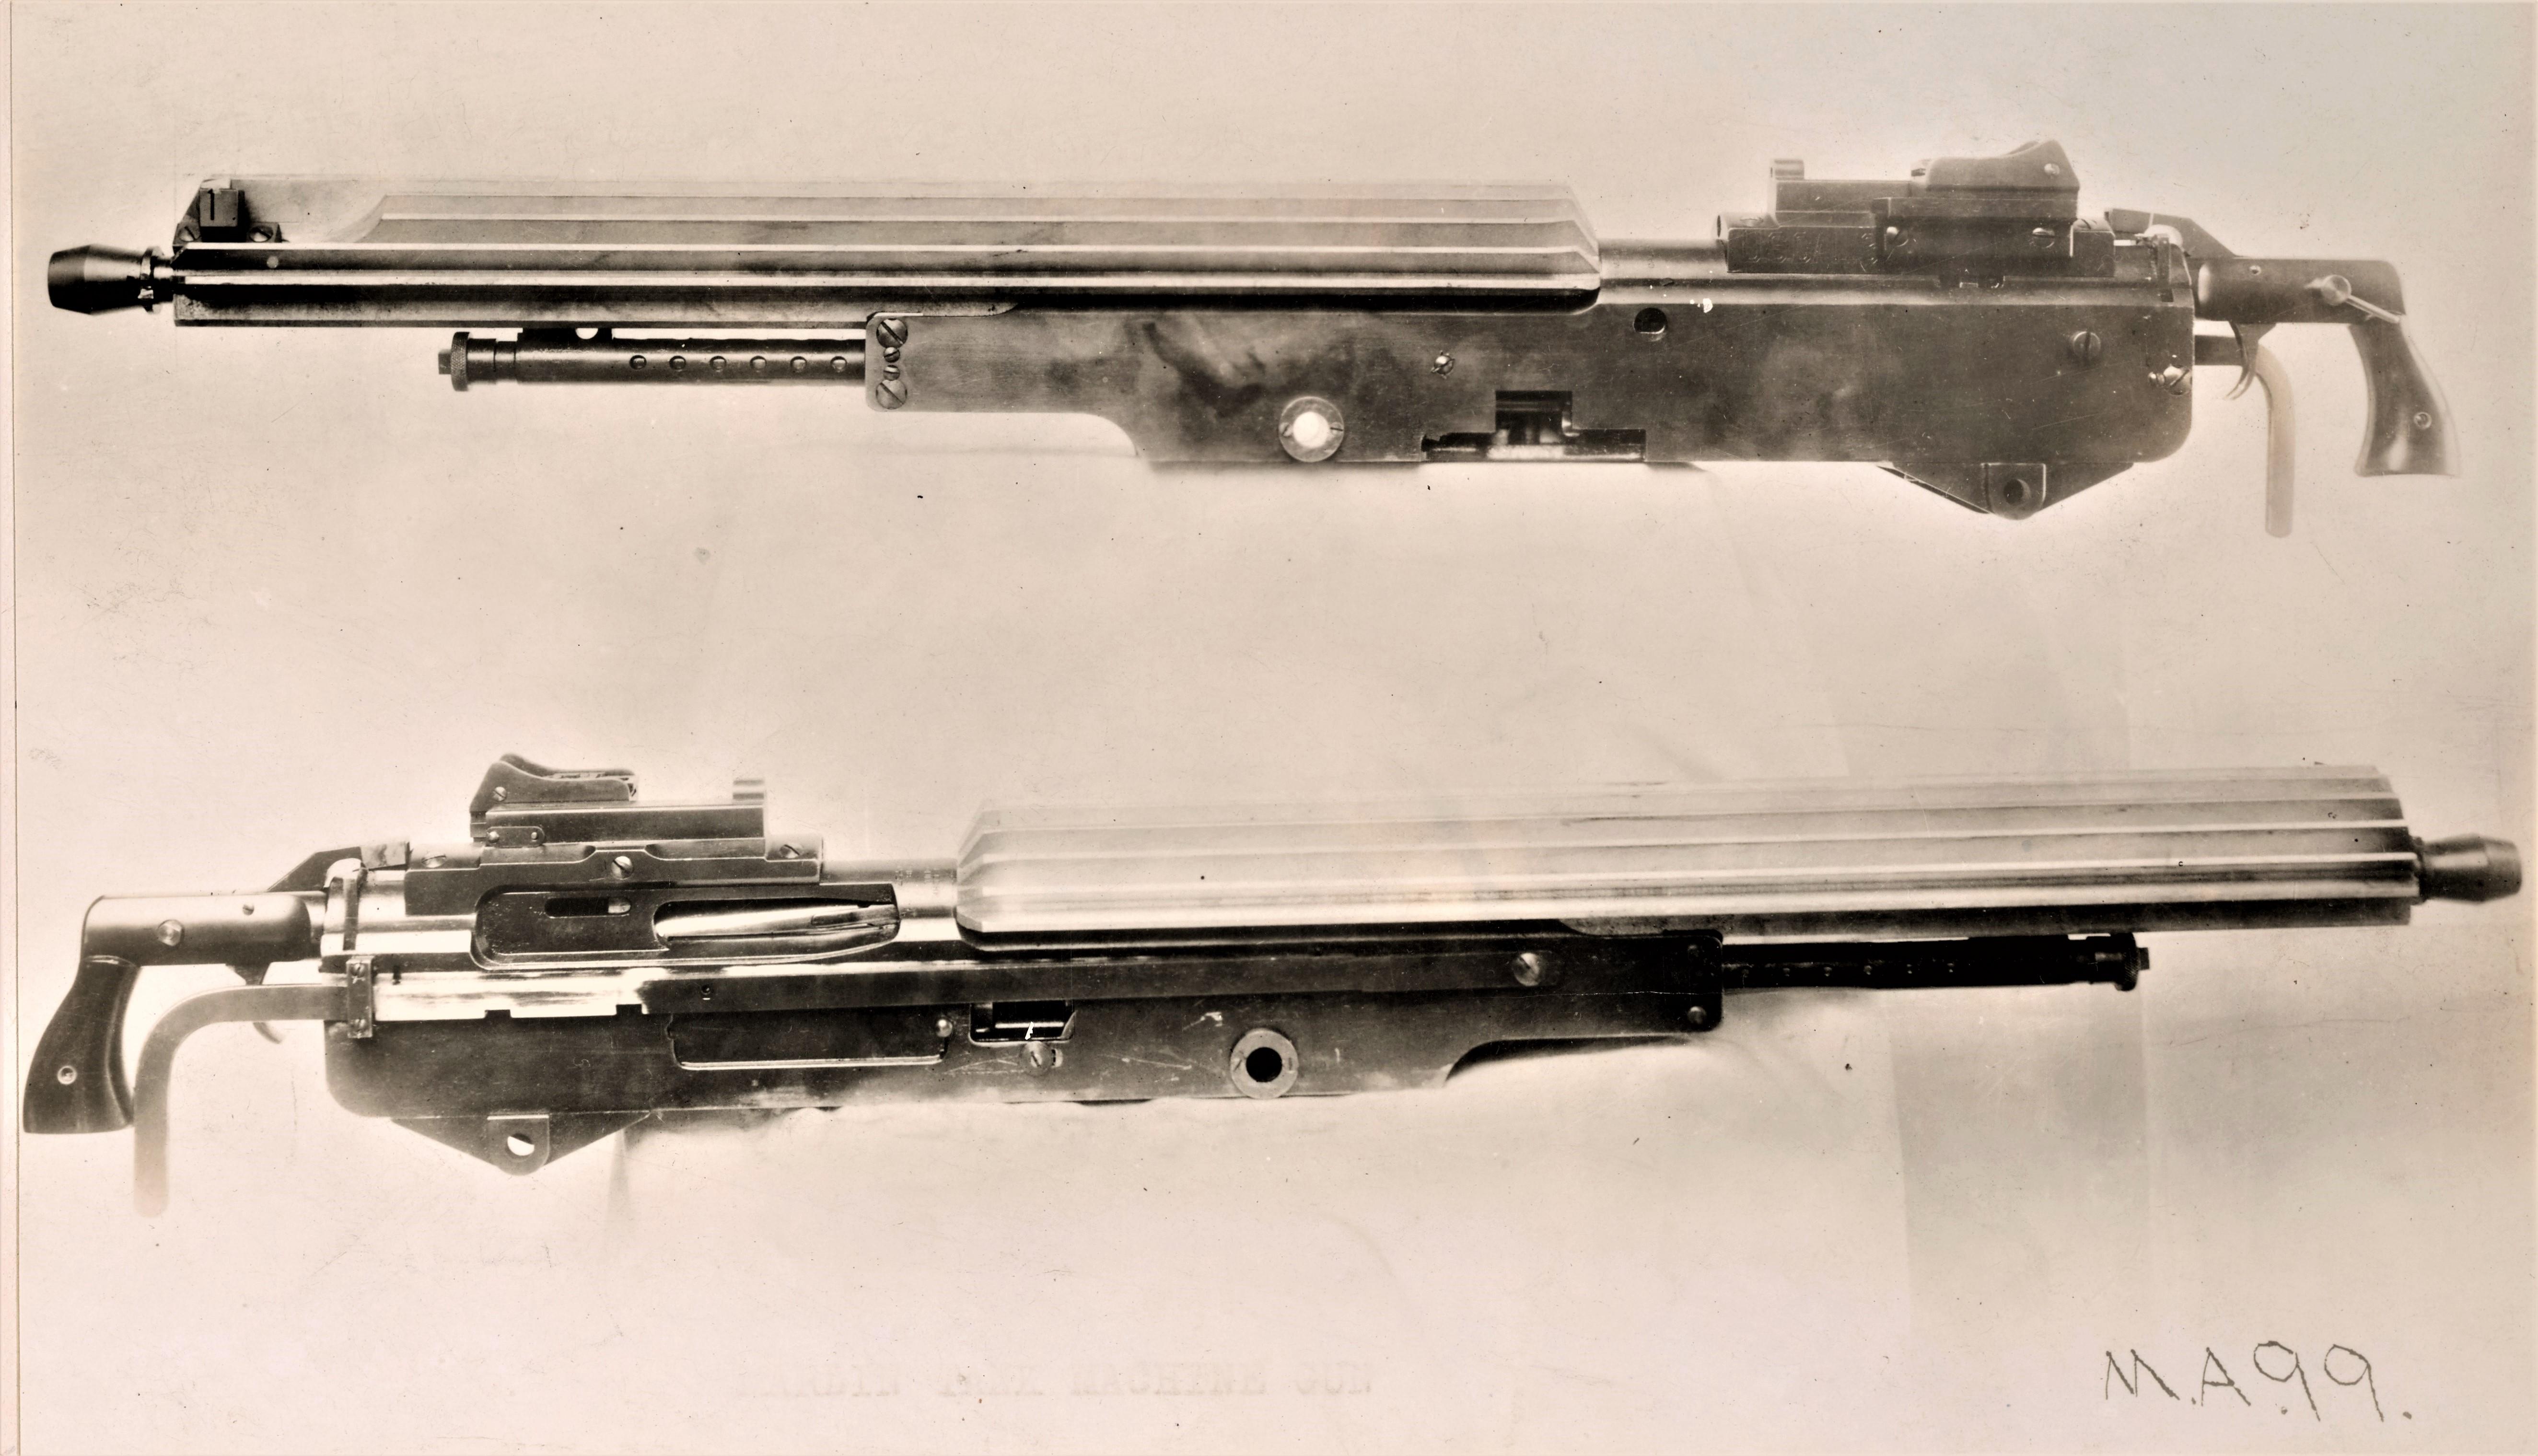 165-WW-385F-004 - Copy.jpg